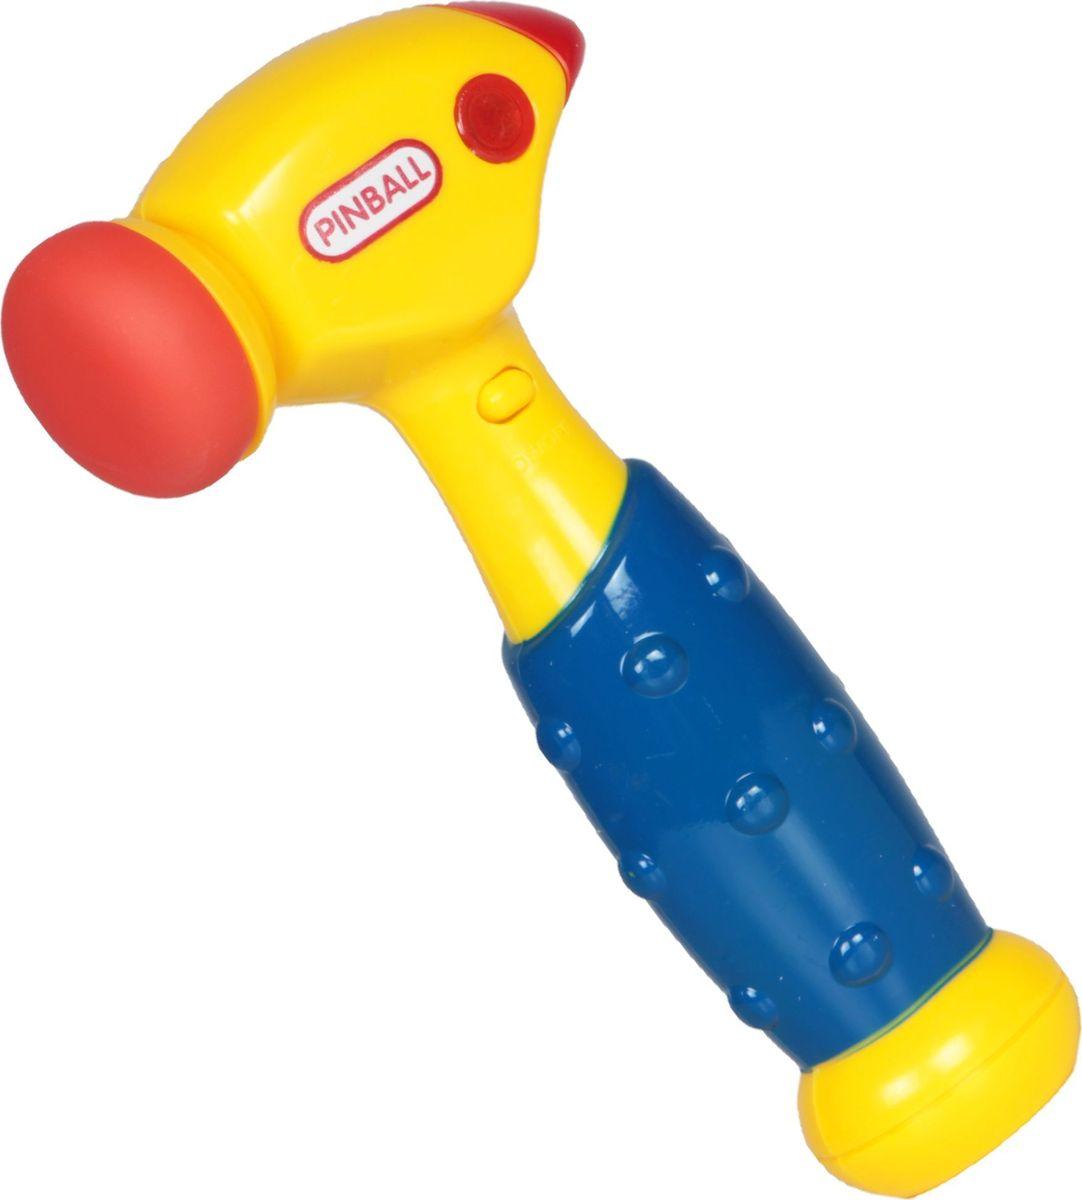 Bairun Развивающая игрушка 666922 игрушка bairun корабль y13436001